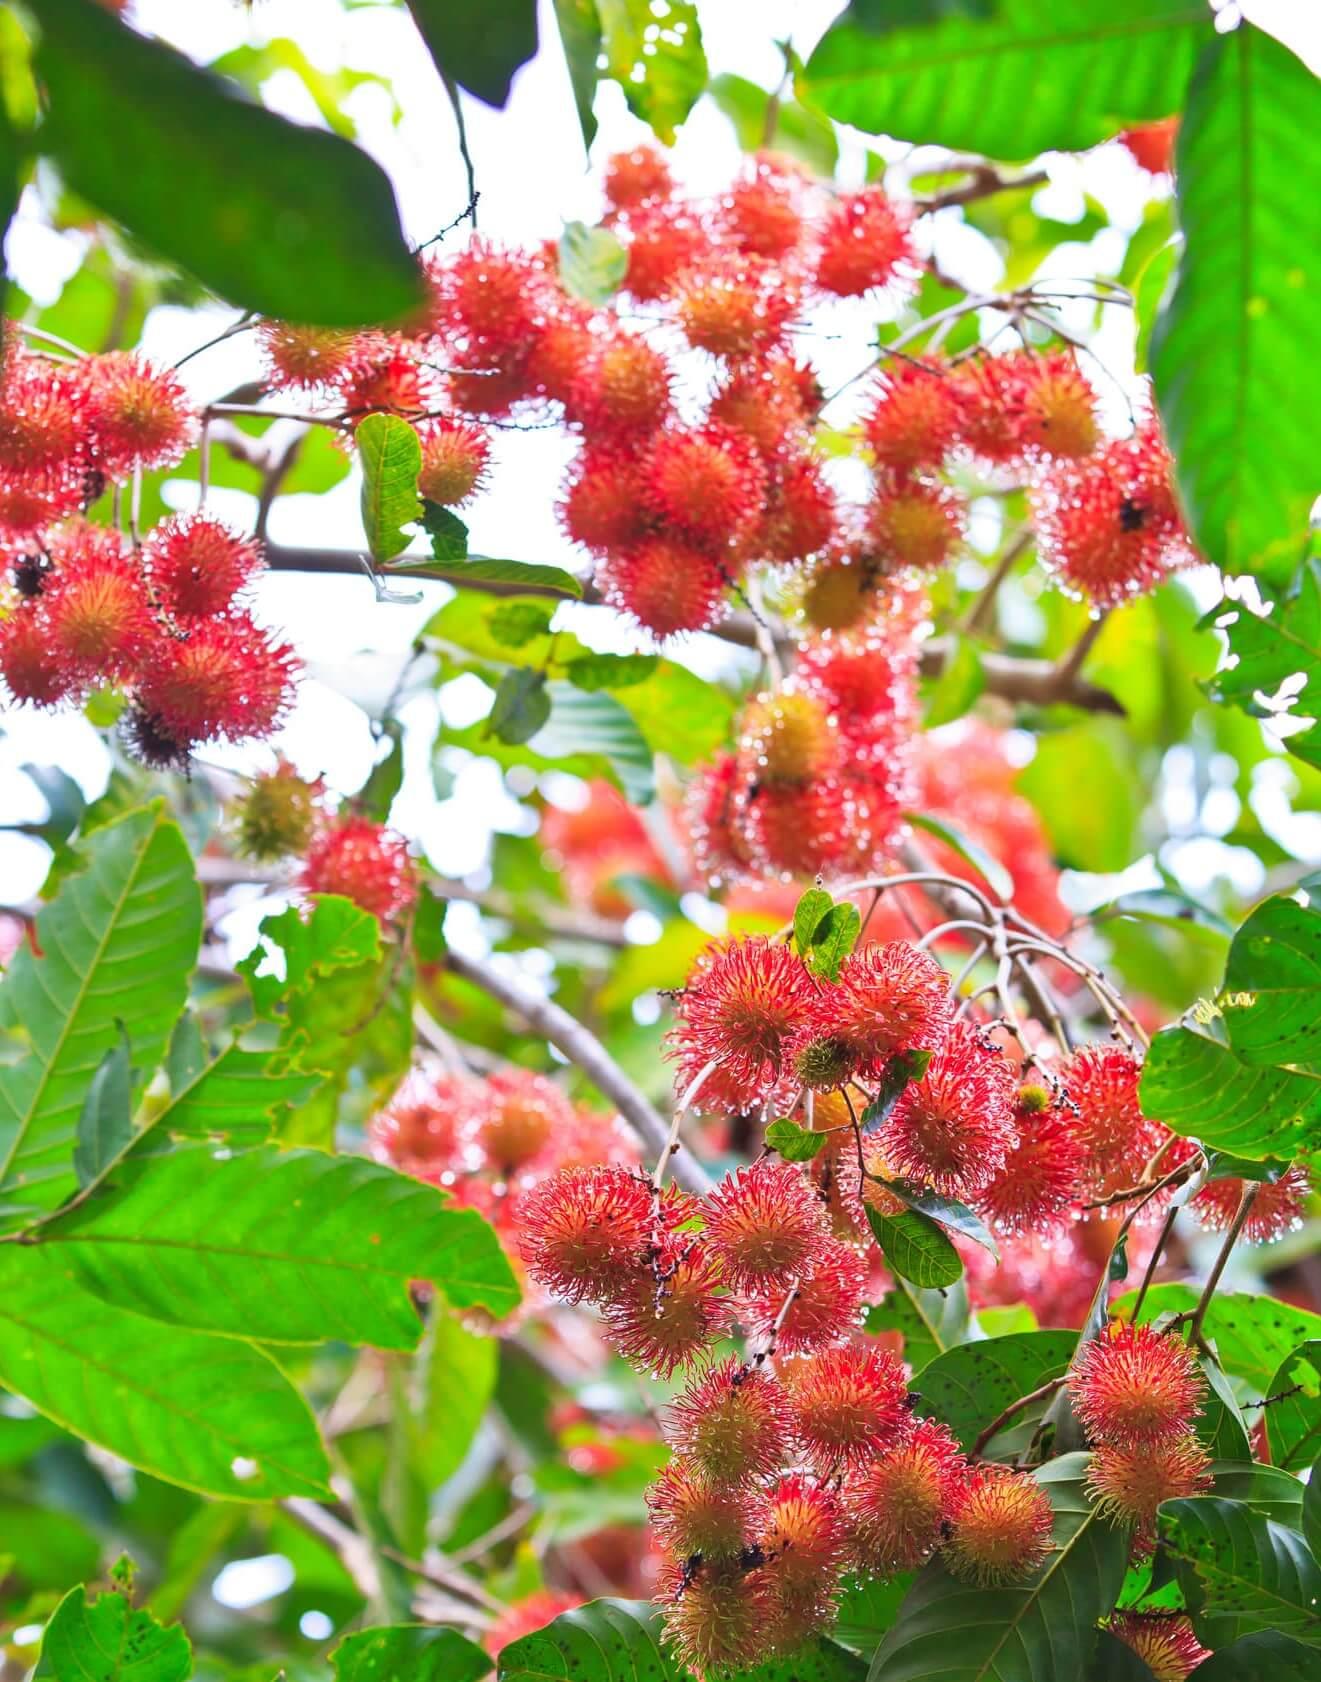 rambutans on the tree